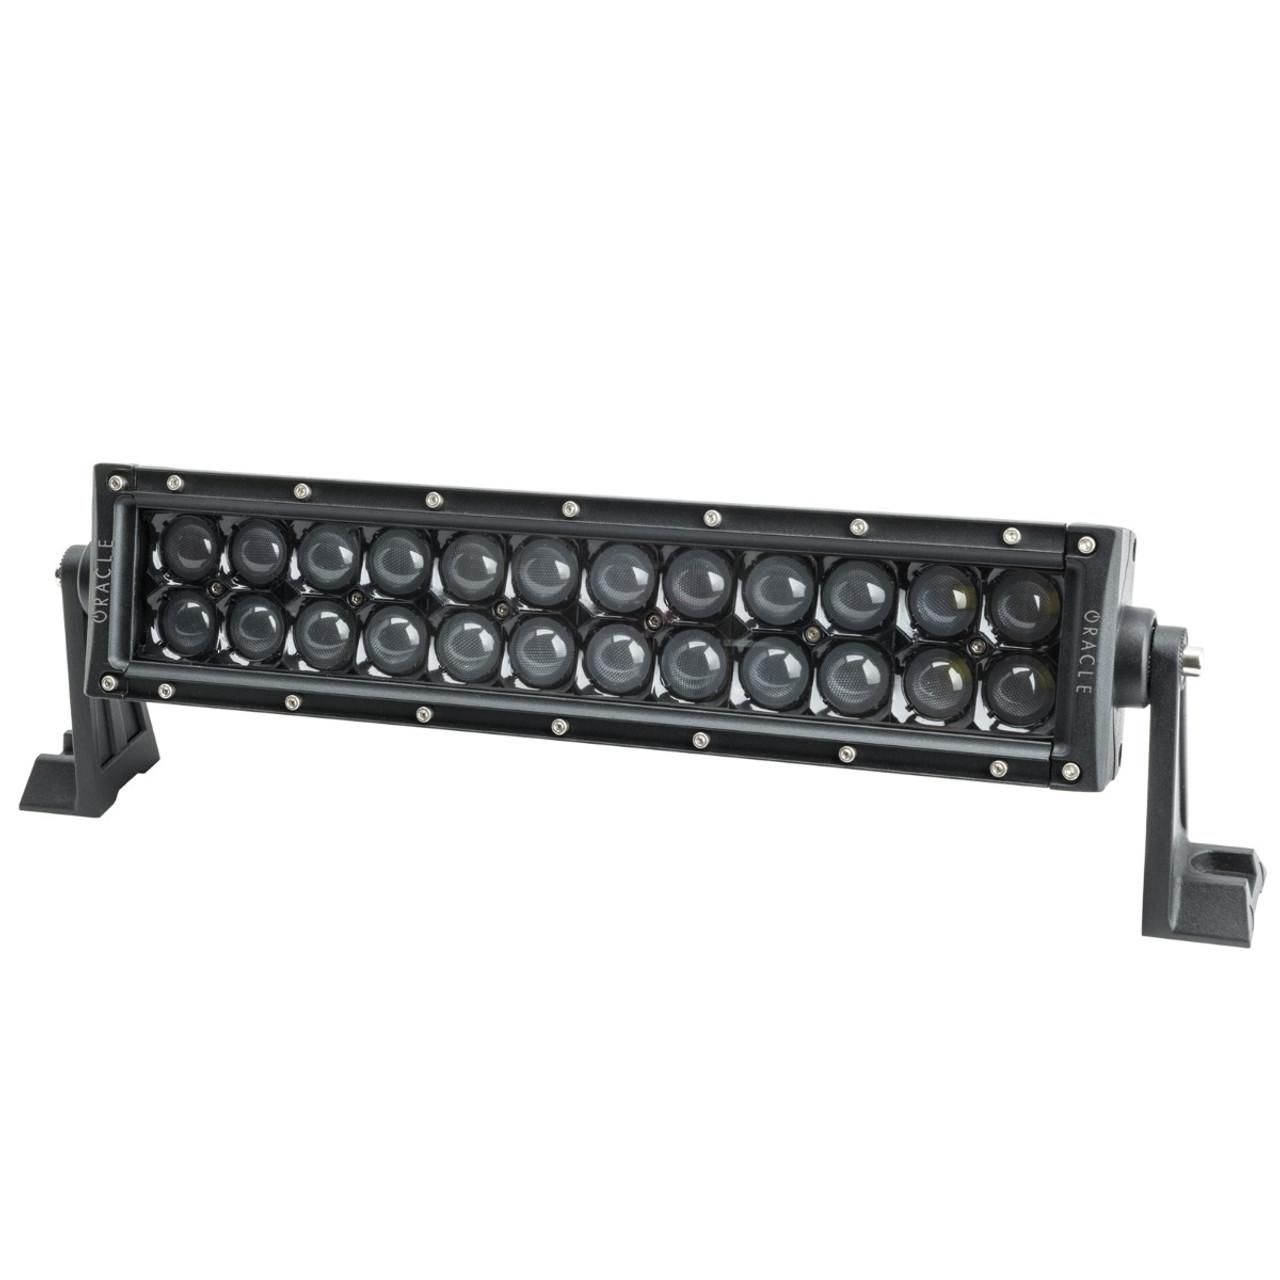 BLACK SERIES - 7D 13.5in 72W DUAL ROW LED LIGHT BAR